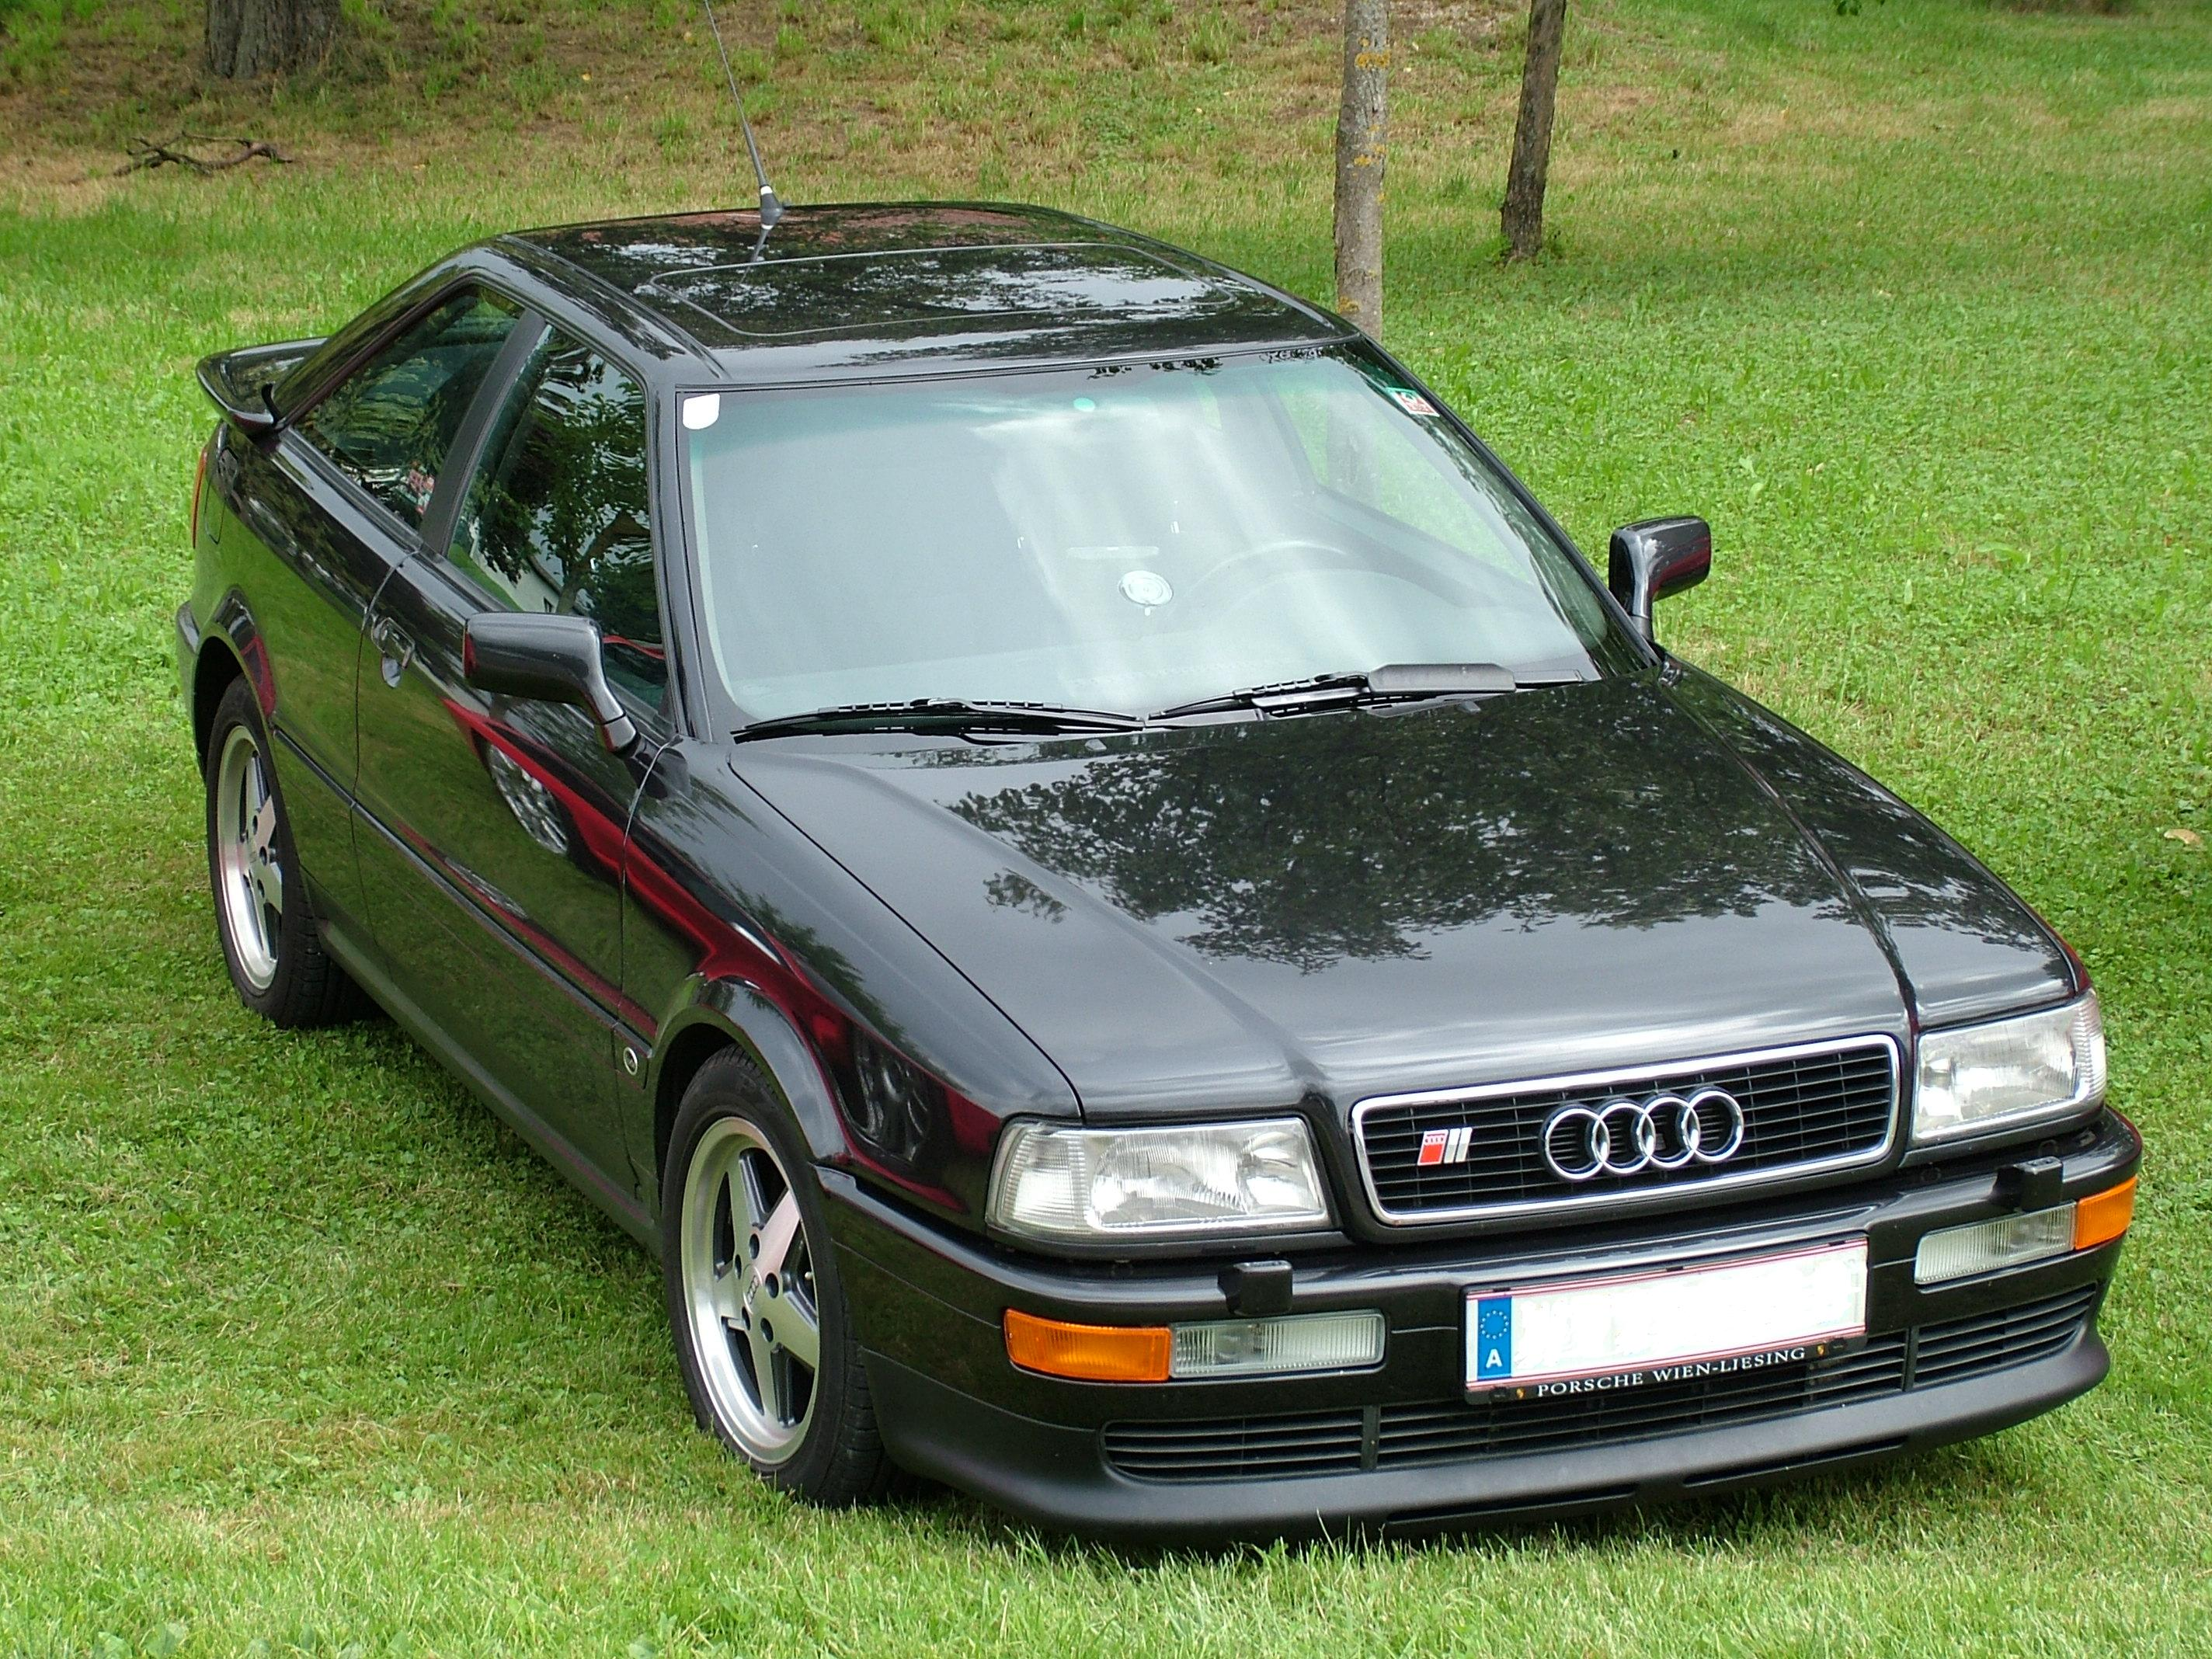 Kelebihan Kekurangan Audi Coupe S2 Review